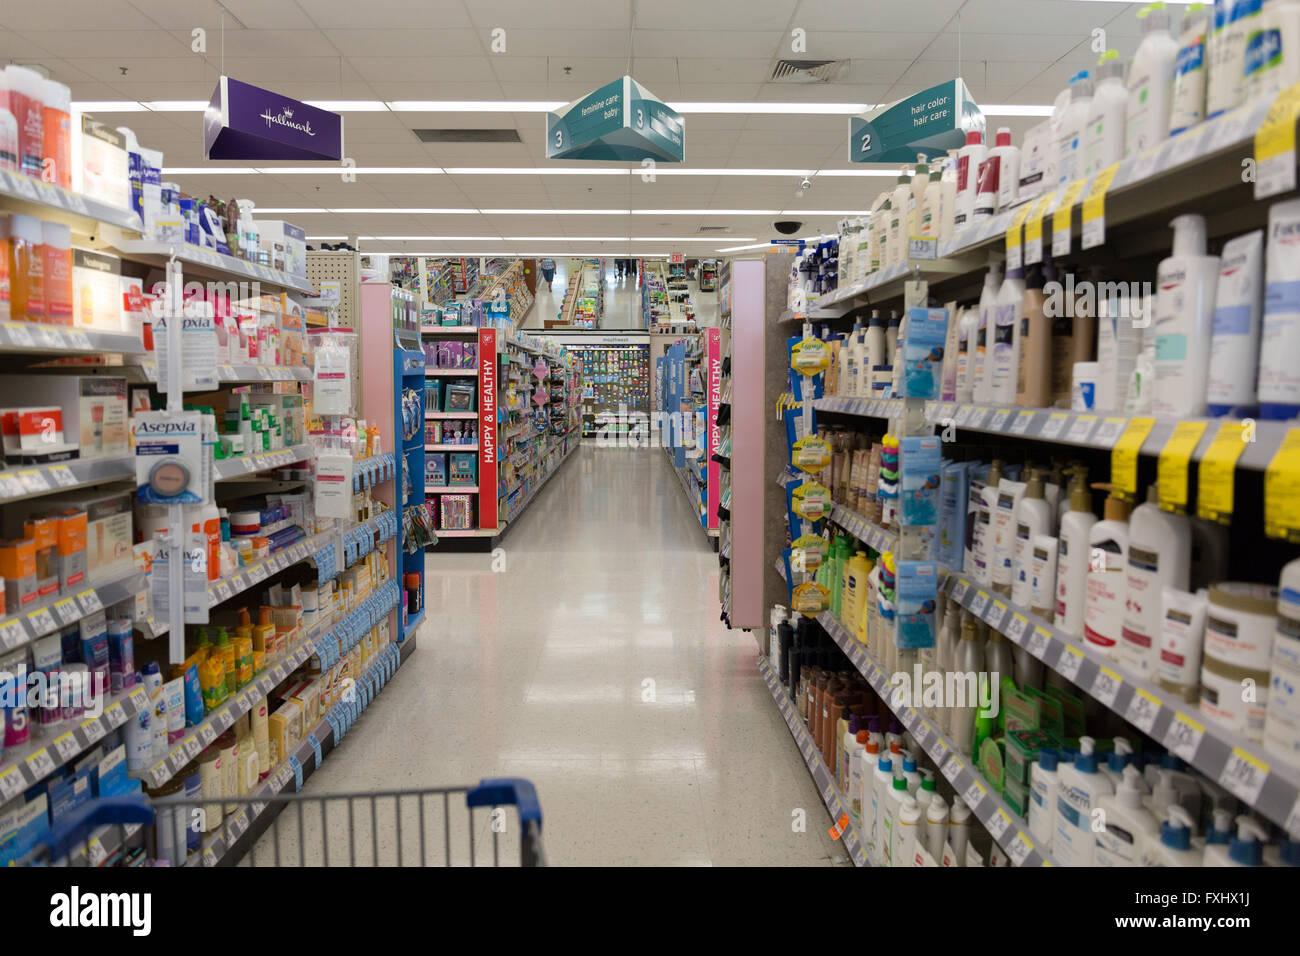 walgreens stock photos walgreens stock images alamy inside a walgreens store stock image